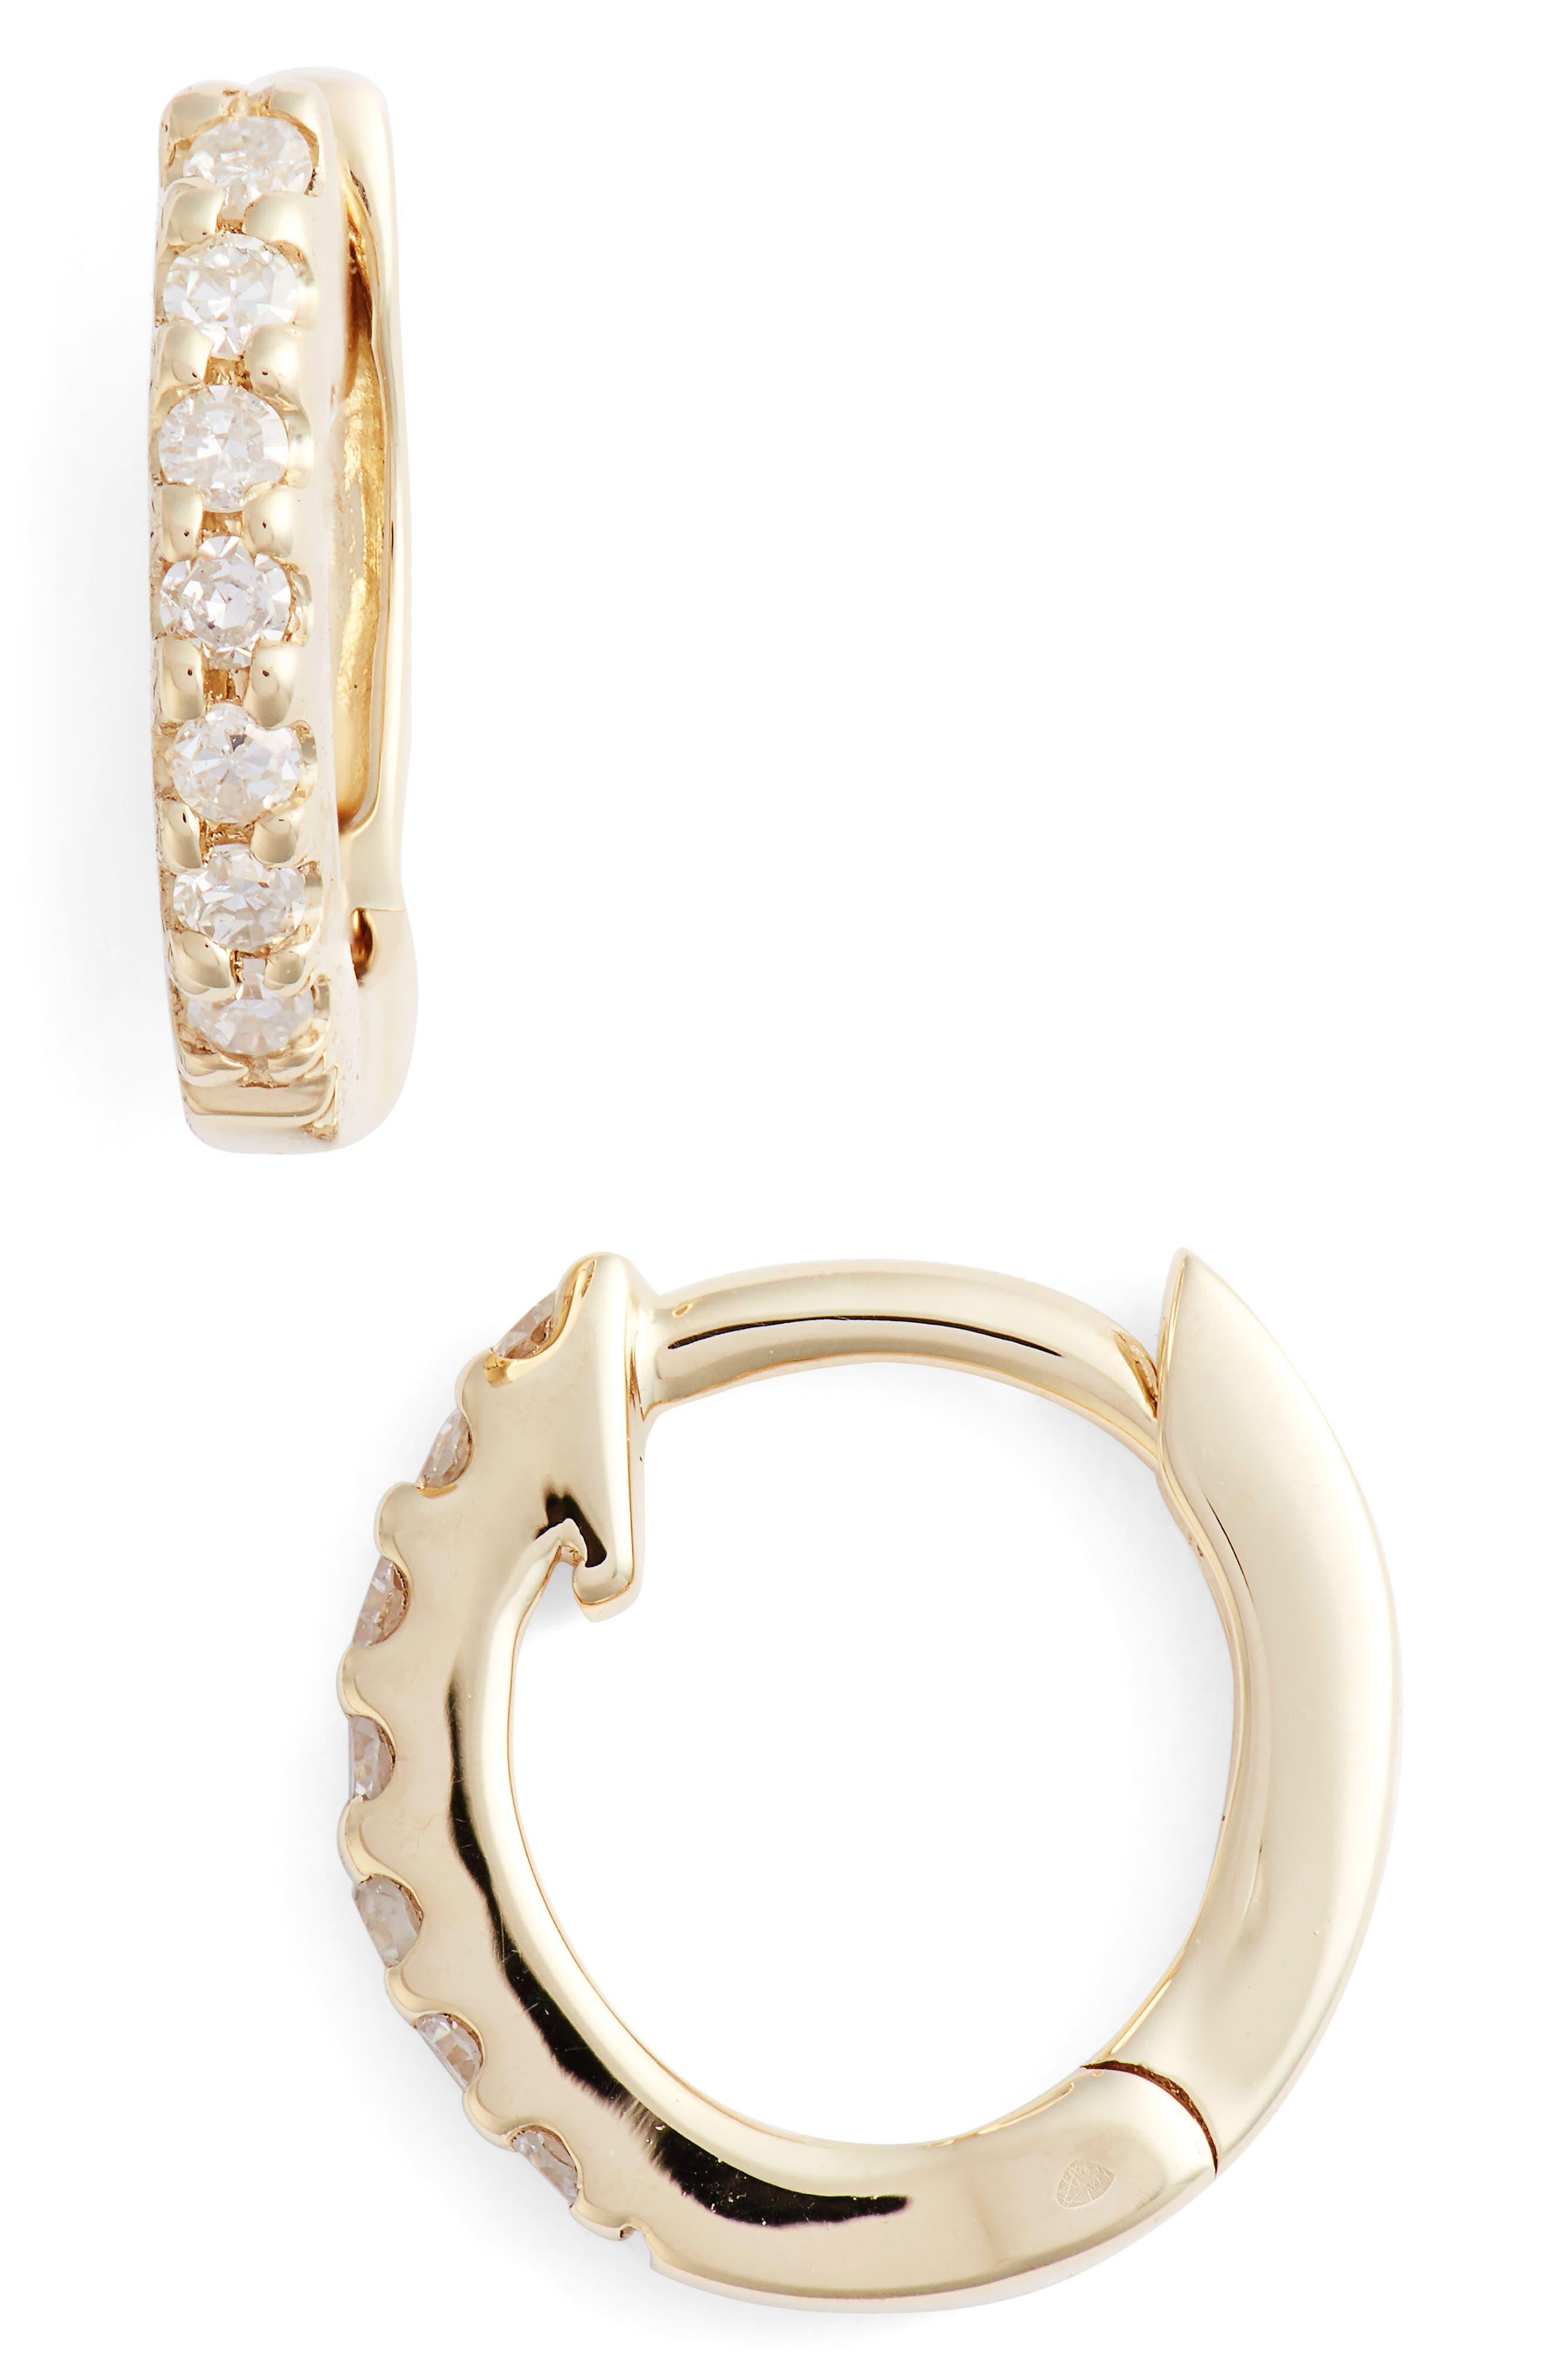 DANA REBECCA DESIGNS,                             Mini Diamond Huggies,                             Main thumbnail 1, color,                             YELLOW GOLD